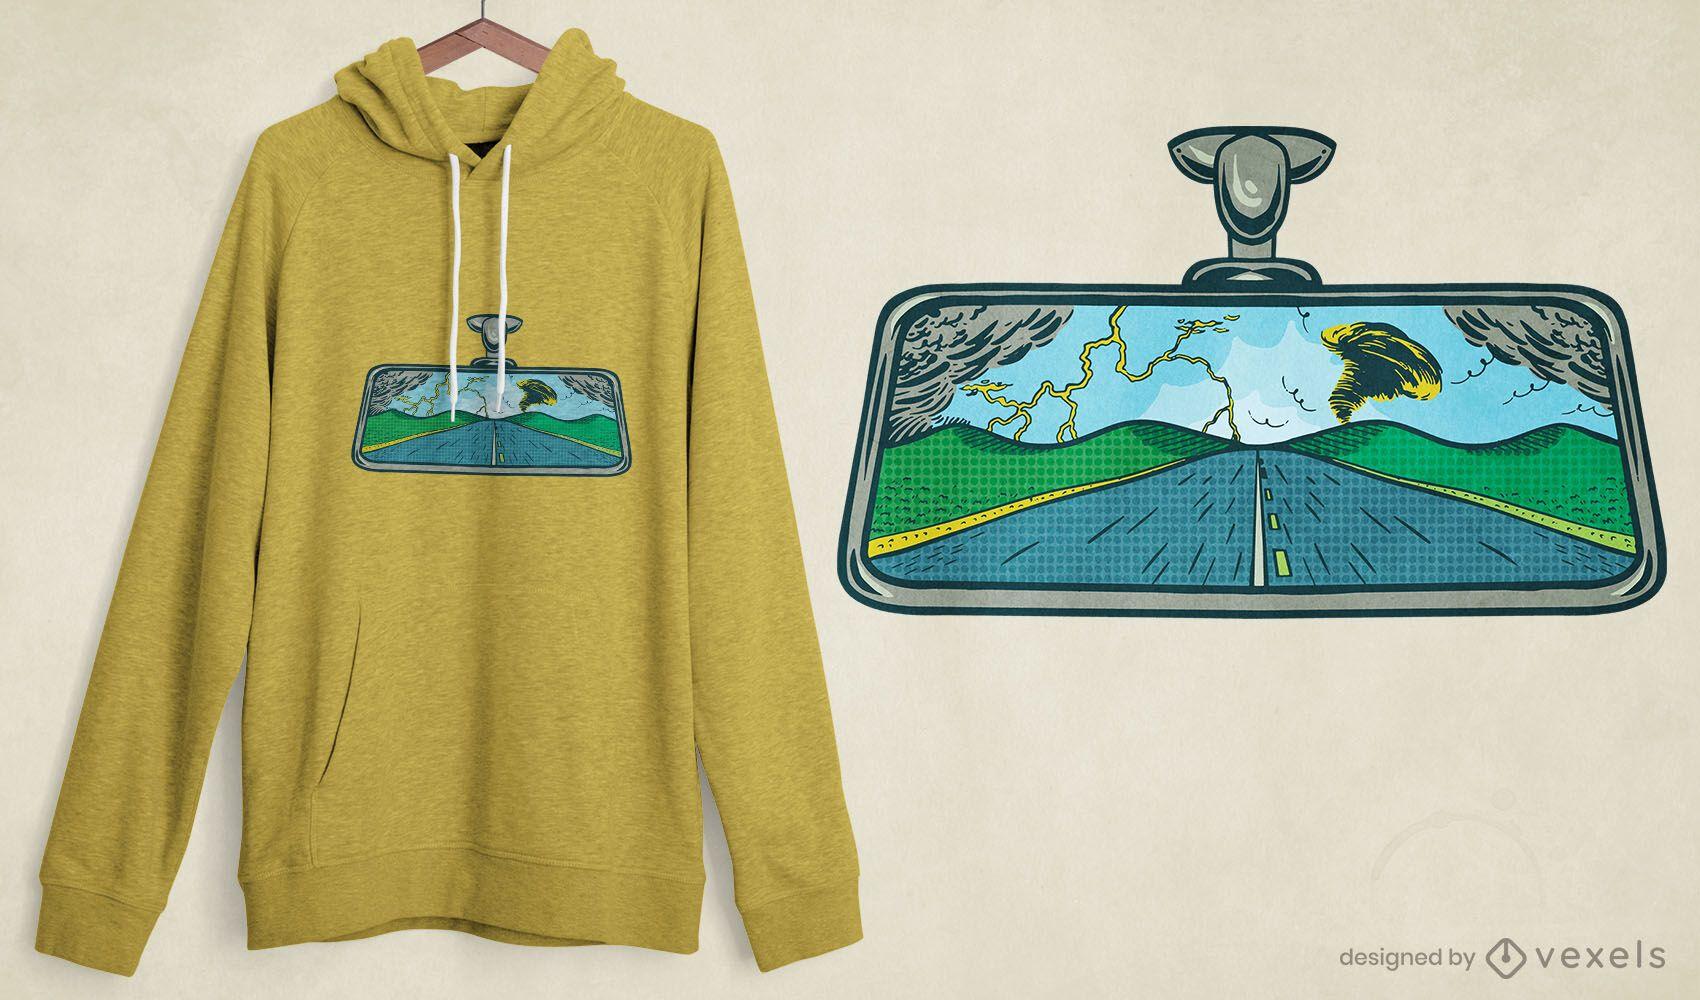 Rear-view mirror road t-shirt design